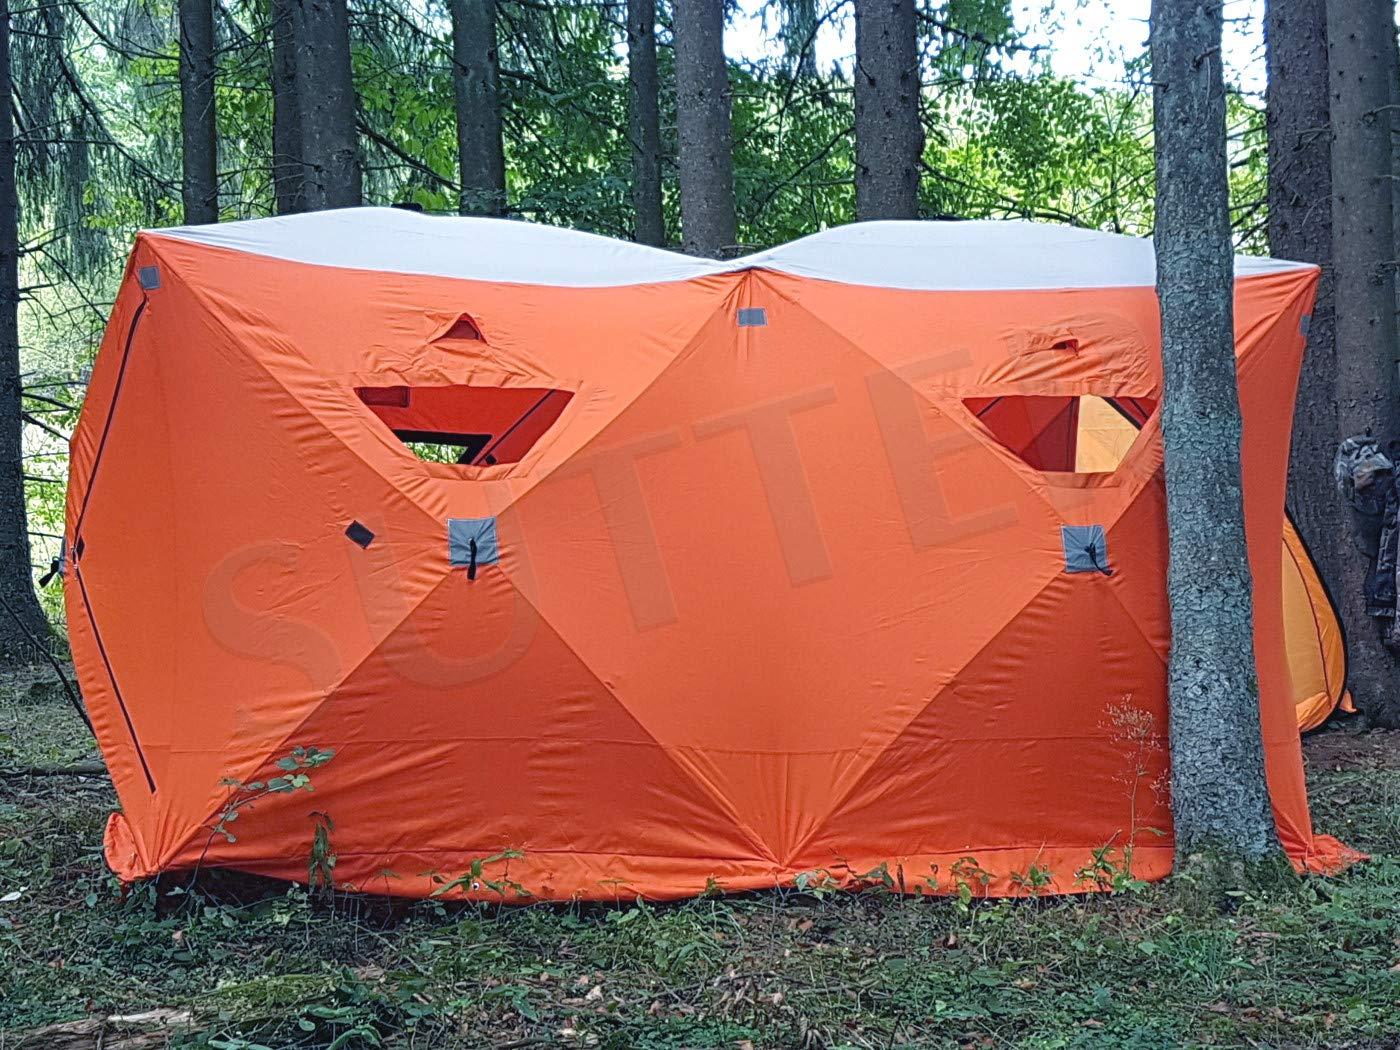 SUTTER Extra gro/ßes Quick-Up Zelt 300x150cm Eiszelt // f/ür Eisangeln /& Eisfischen u.a // Schnellaufbauzelt Jagdzelt Campingzelt Quicktent//Optimal gesch/ütz